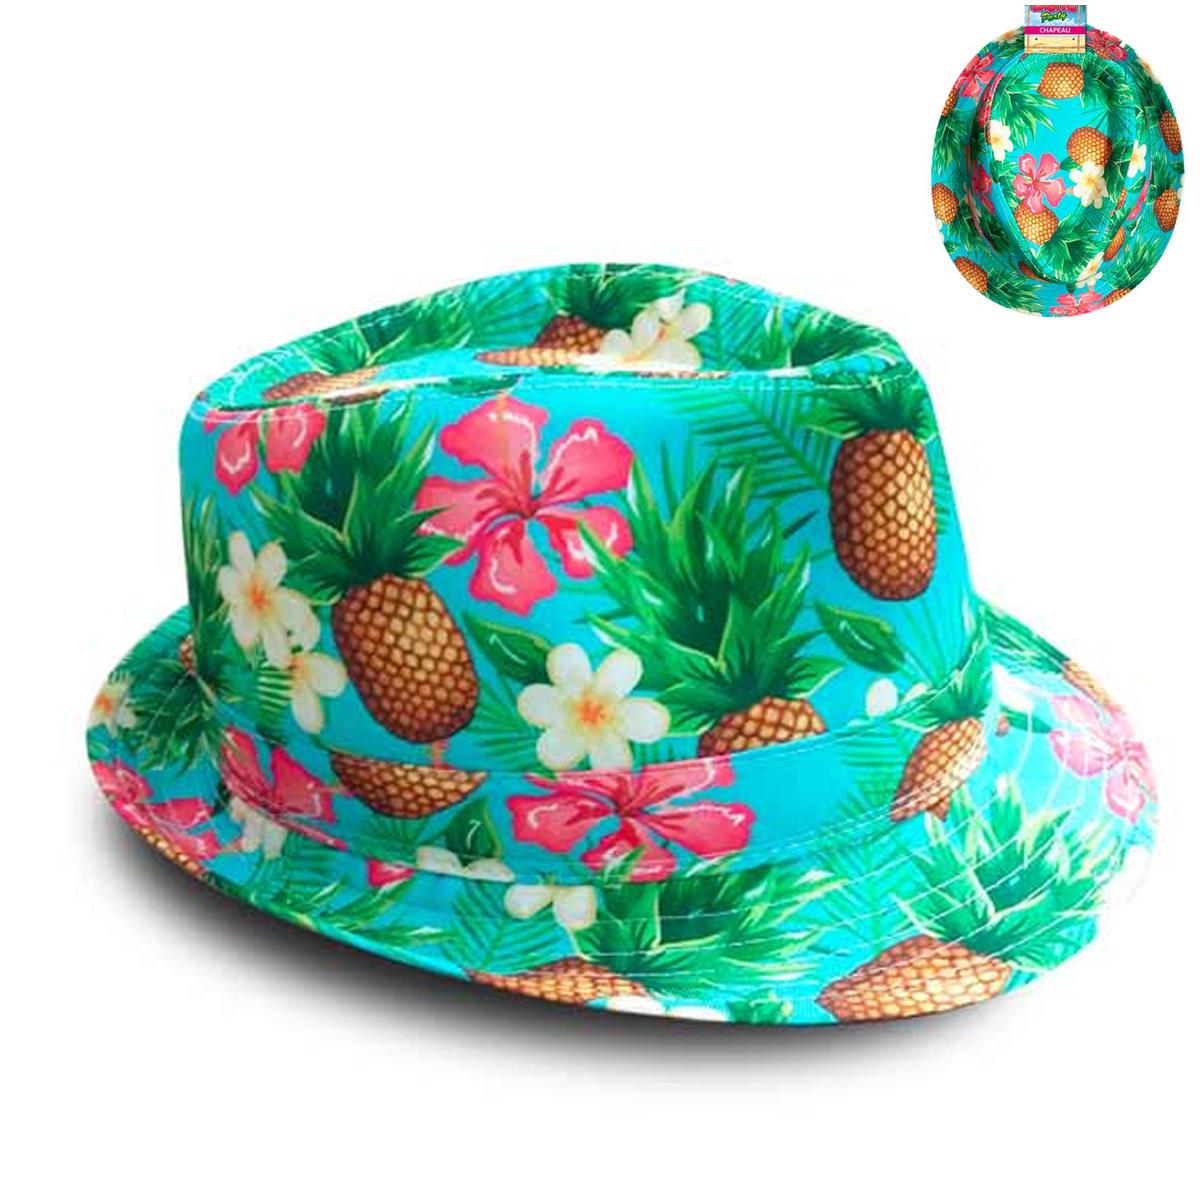 Chapeau borsalino \'Tropical\' multicolore (ananas vanille hibiscus) - taille unique - [R2736]